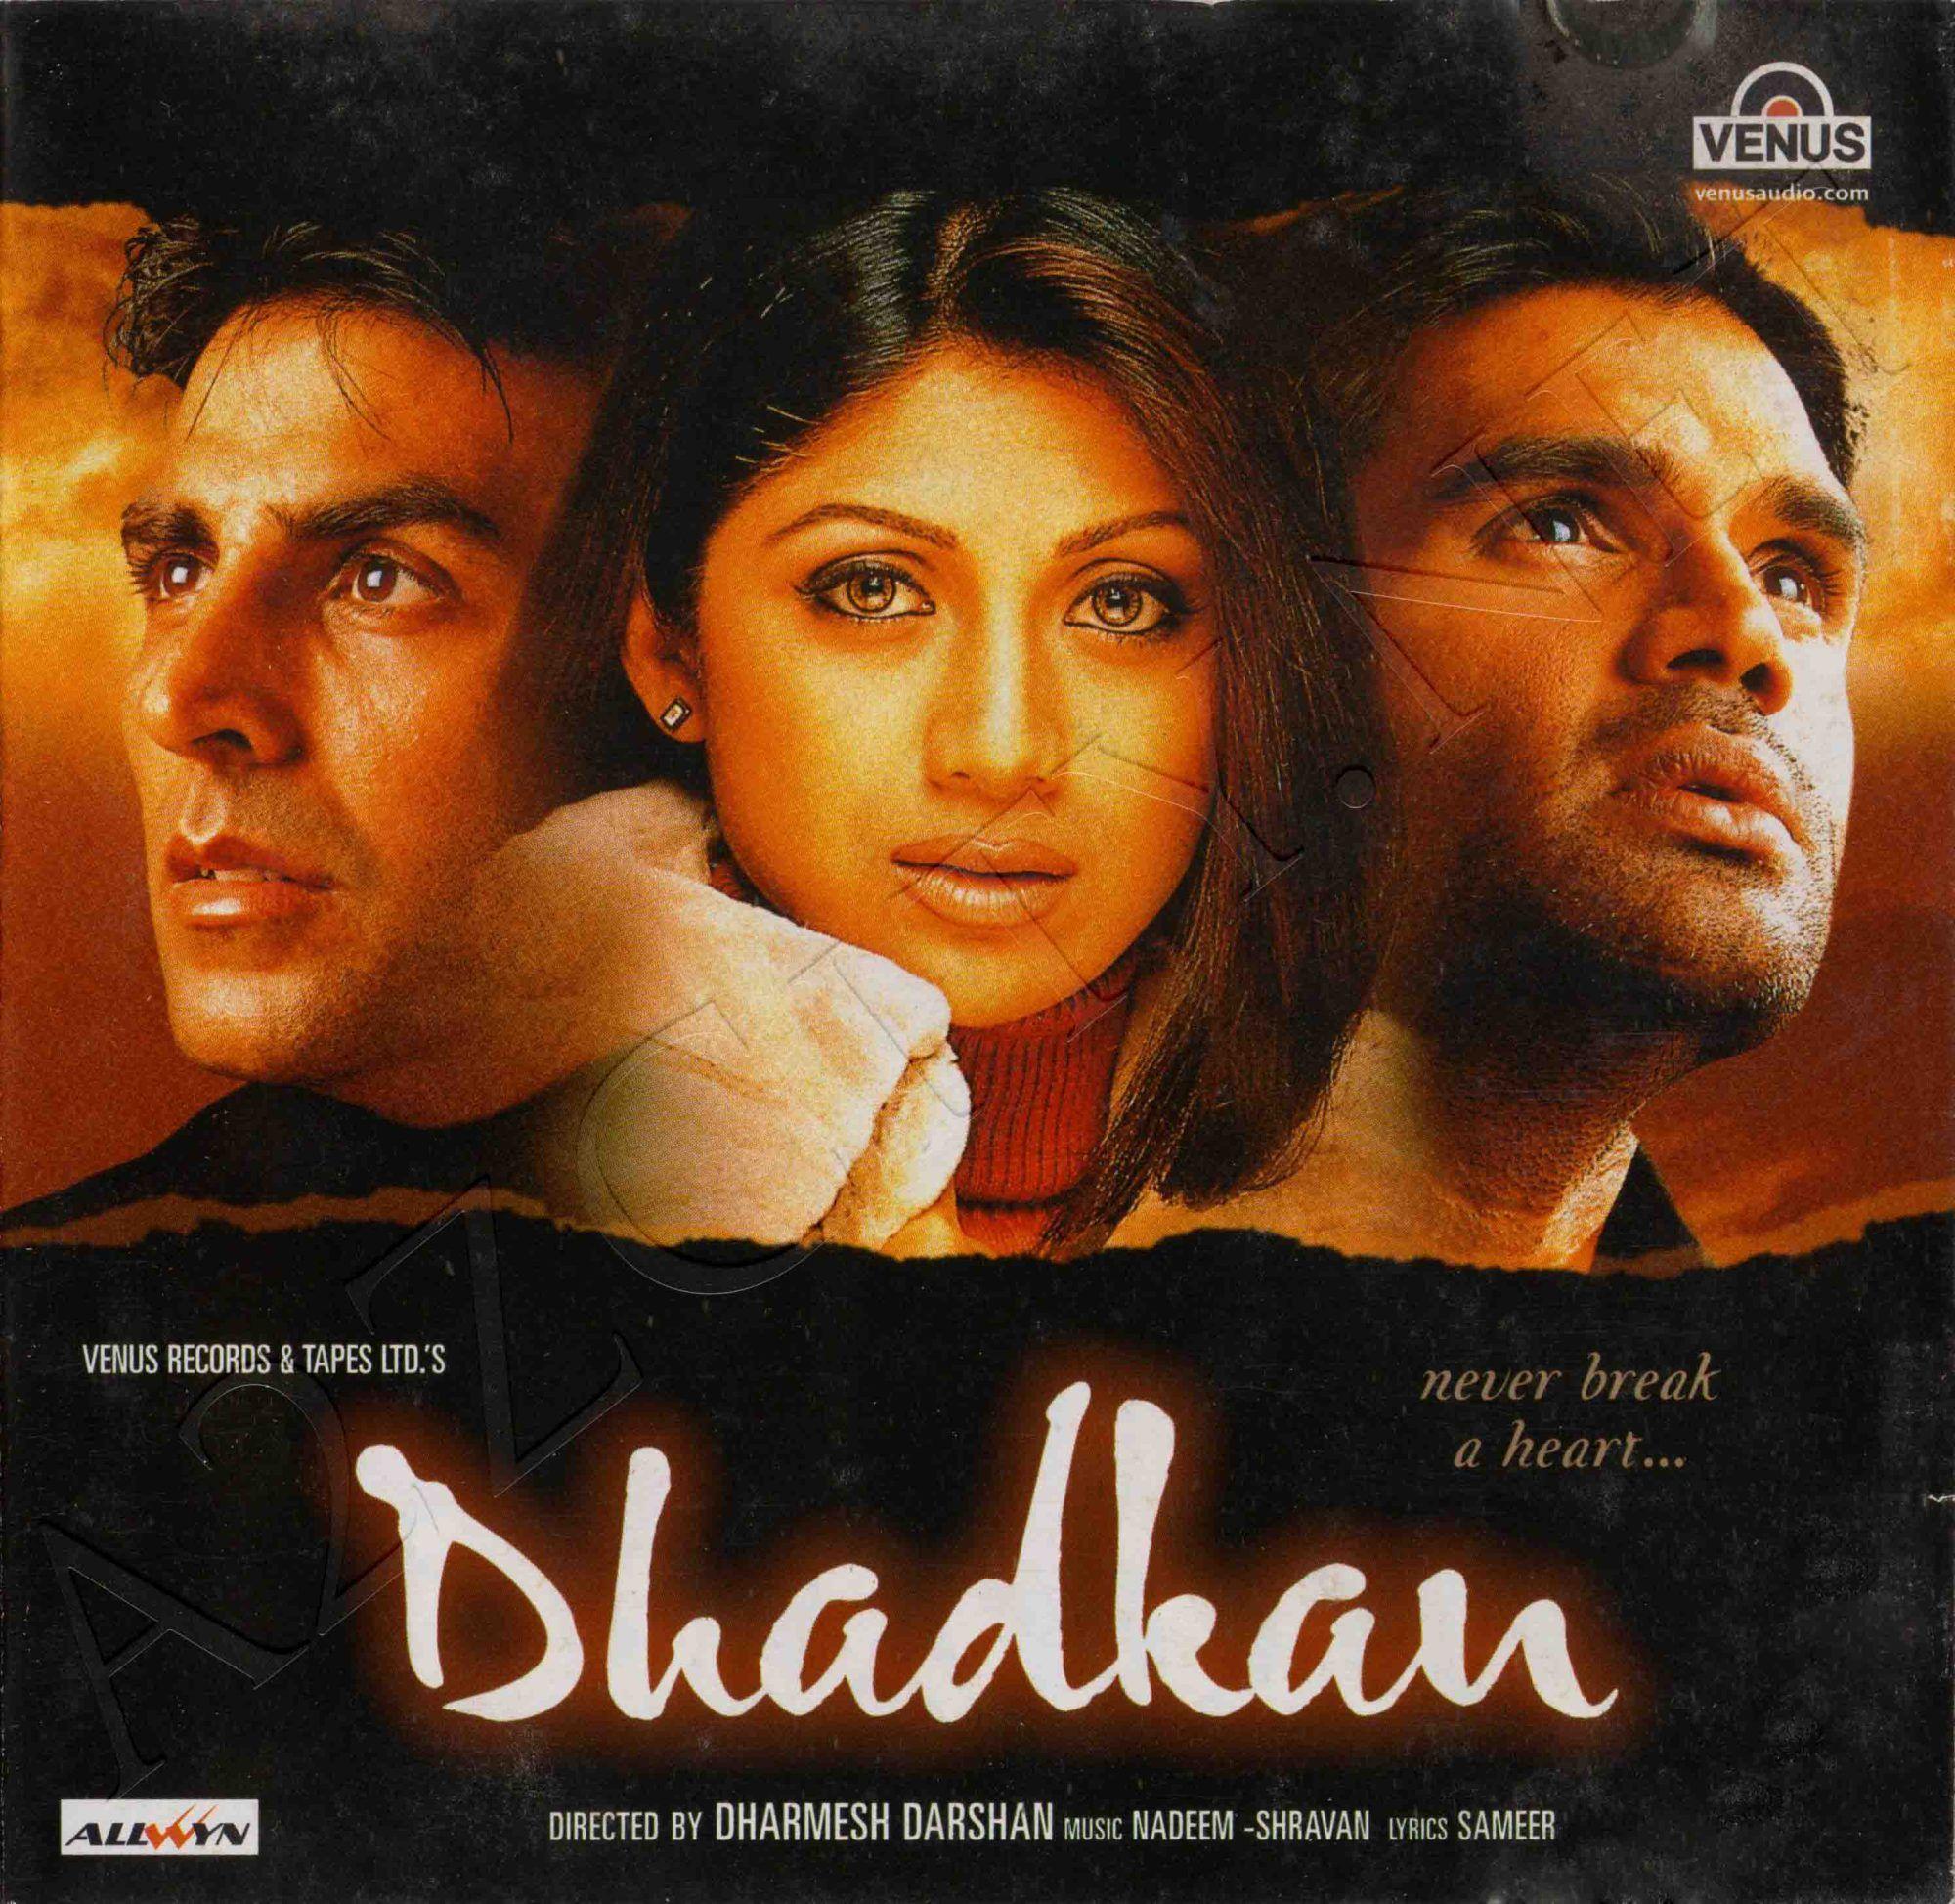 Dhadkan 2000 Flac Latest Movie Songs Hindi Movies